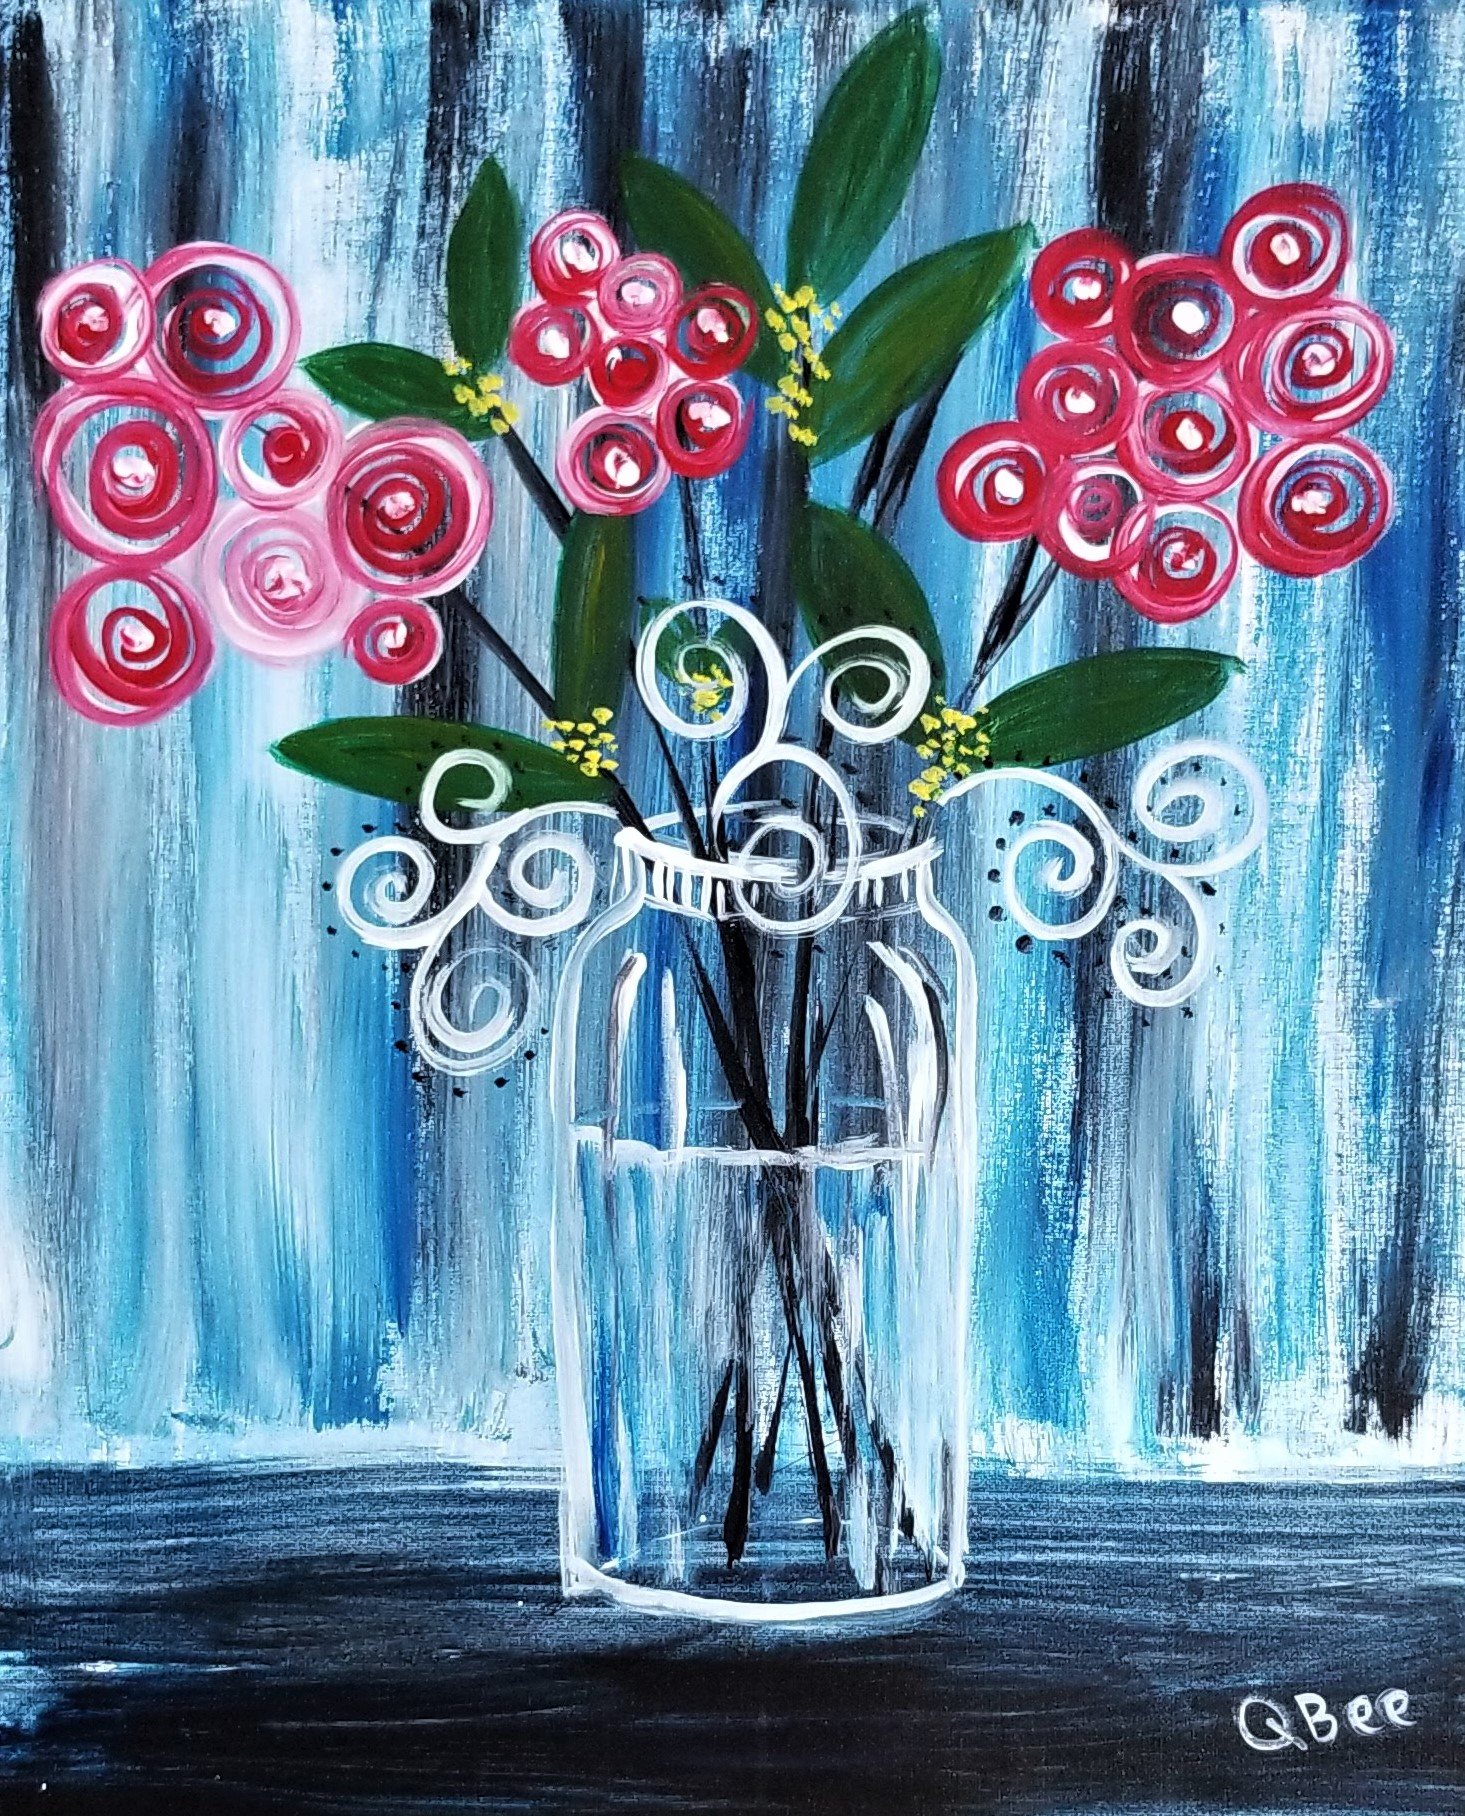 Whimsical Jar Flowers